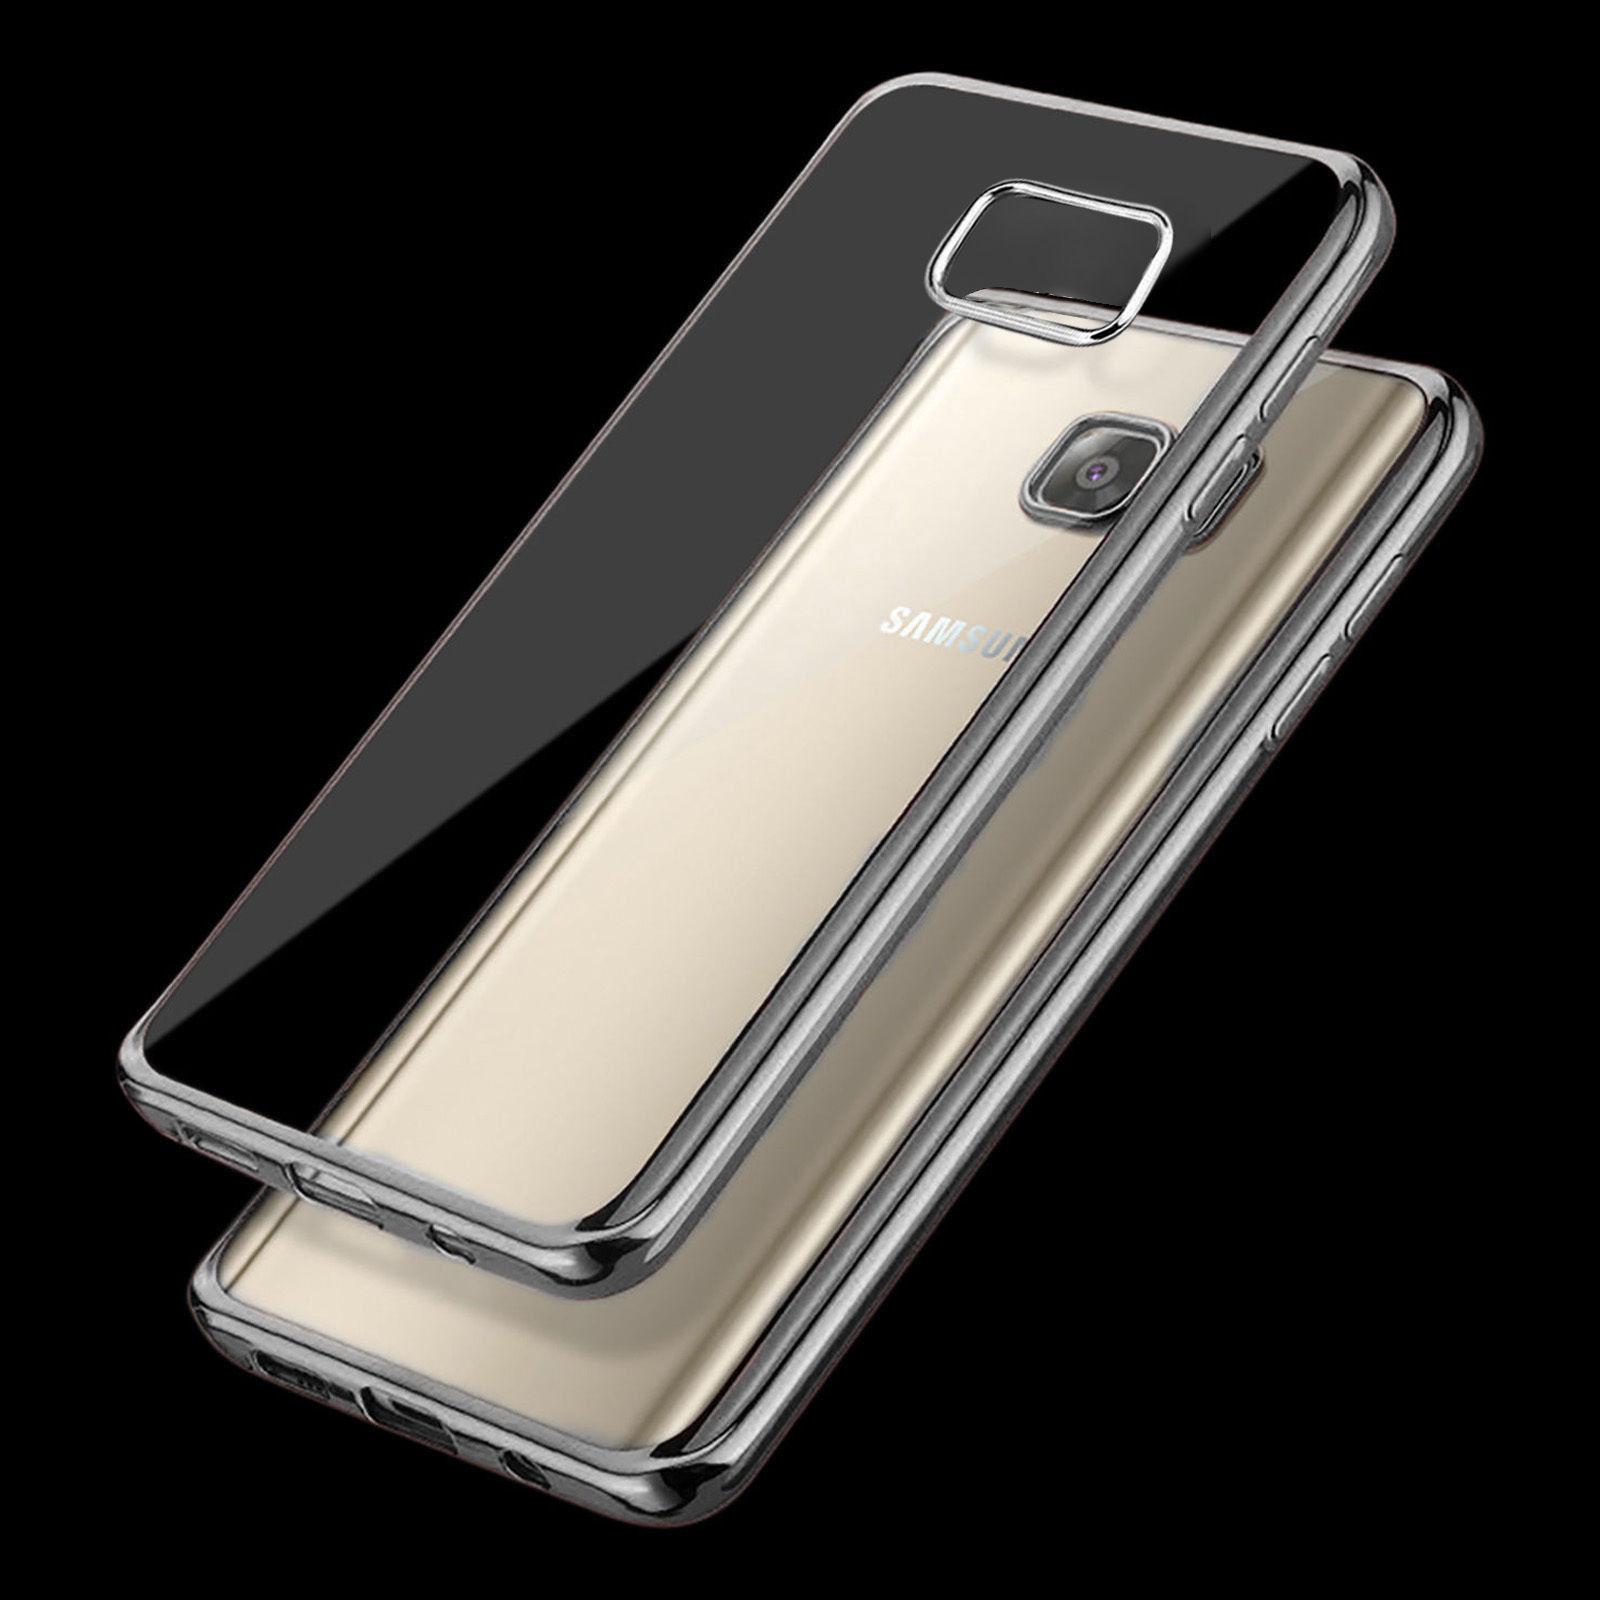 Ultra tenké gelové pouzdro s designovým rámečkem pro Samsung Galaxy S6 Edge+ (SVI G928F) - čer